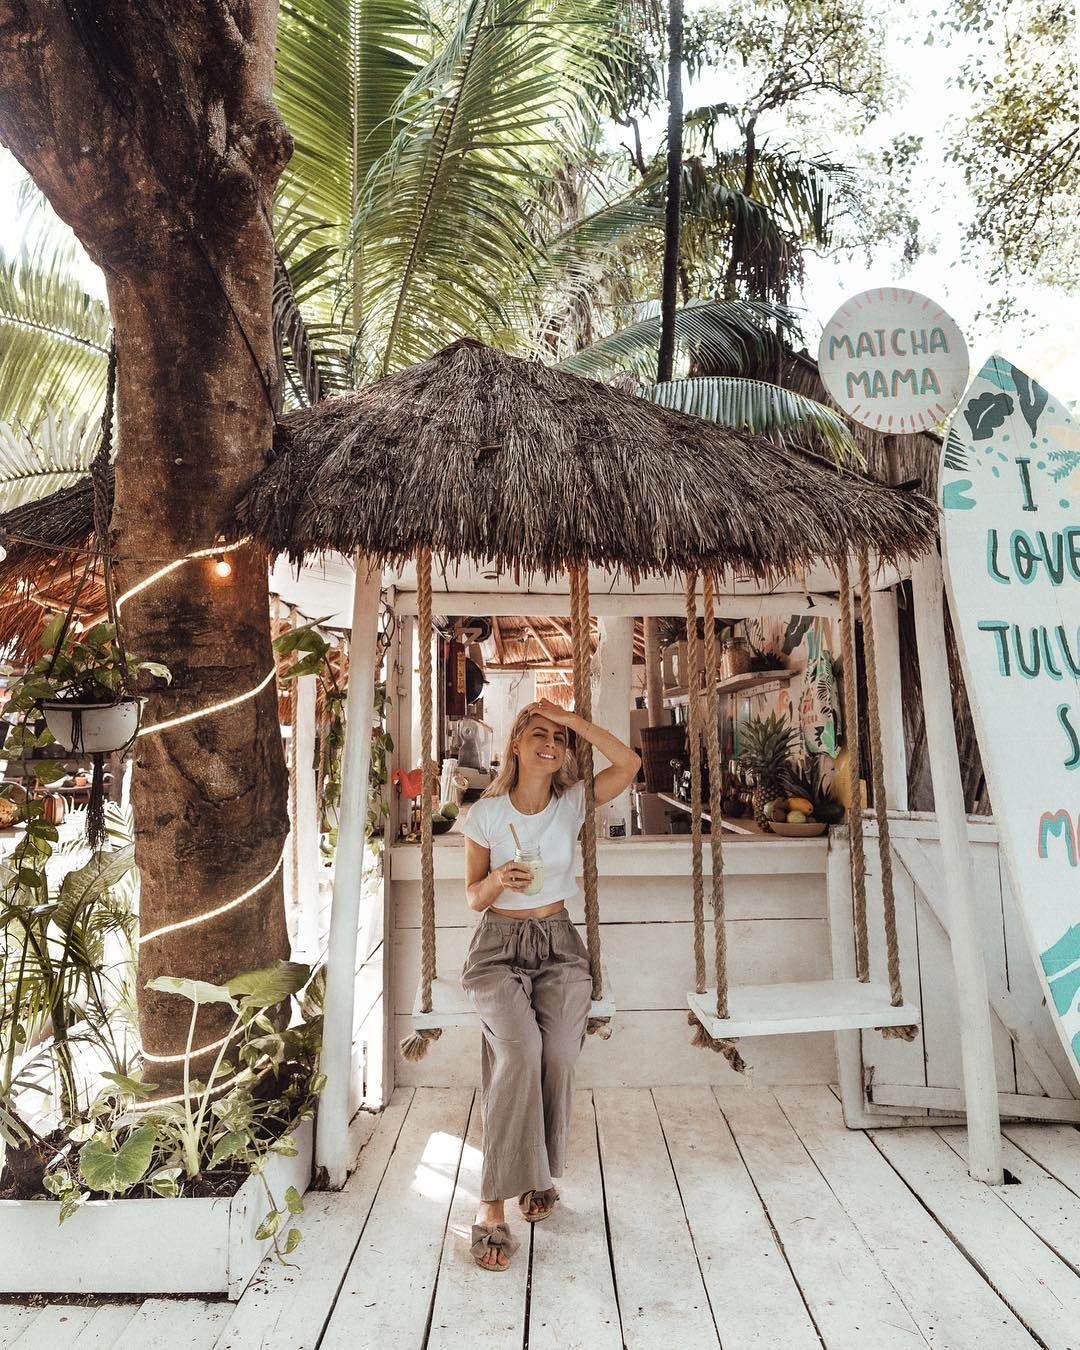 Finduslost On Instagram Tulum Mexico Tulum Rivieramaya Matcha Mexico Playa Del Carmen Fotos Viajes A Cancun Decorando Porches